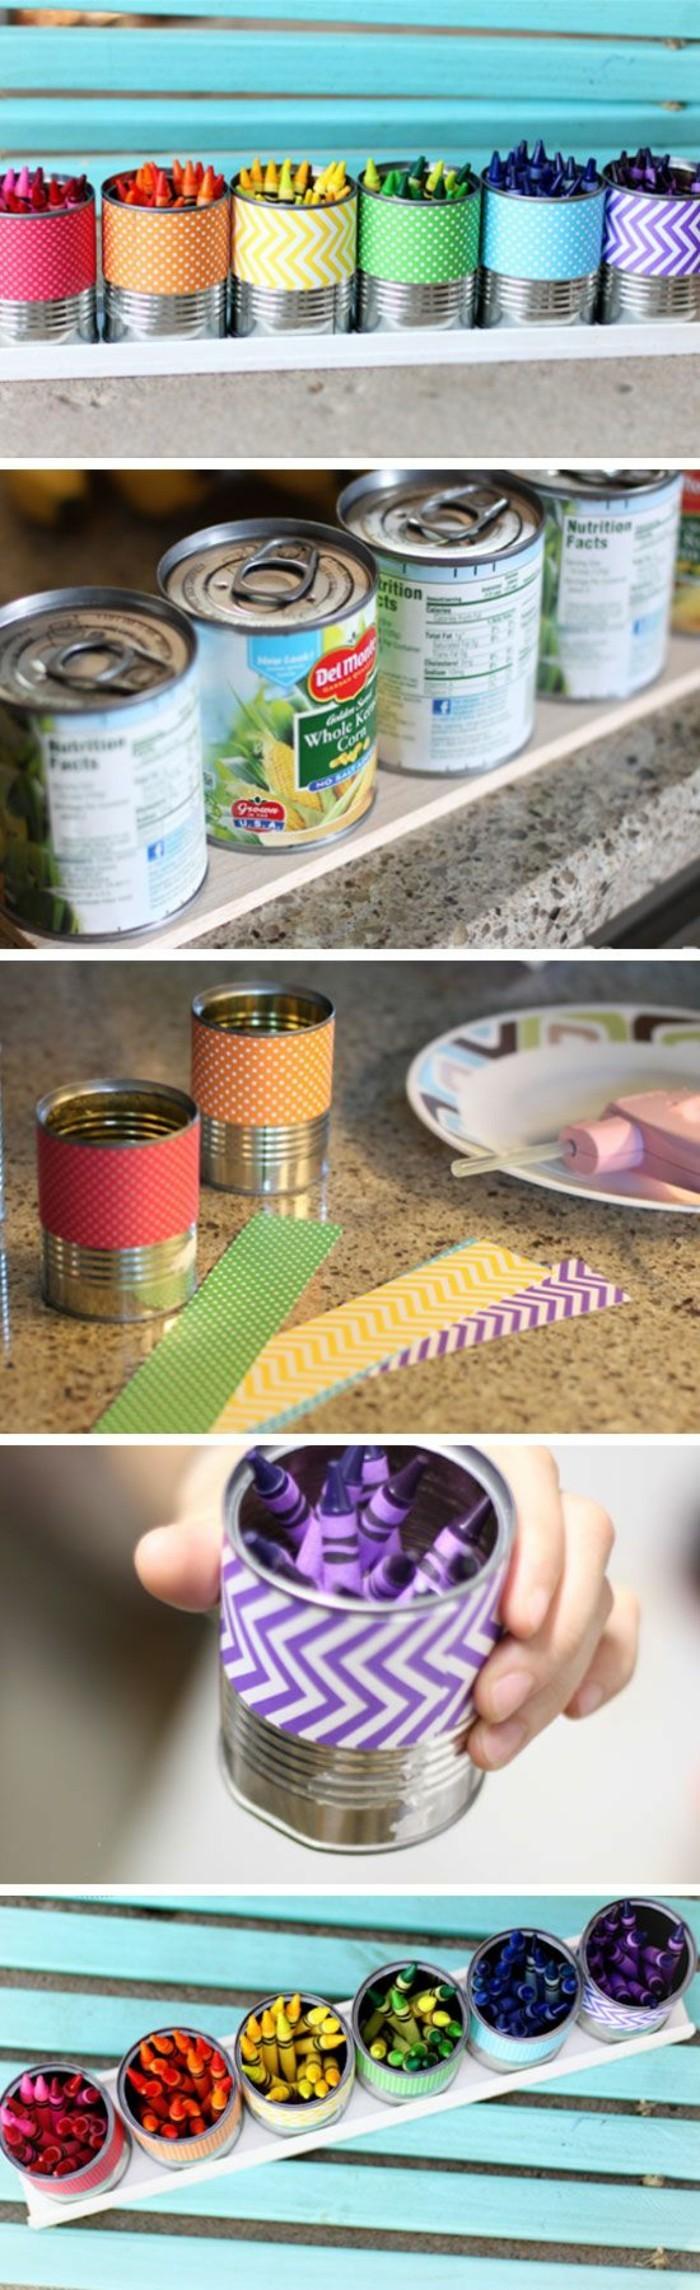 alucinantes ideas de latas de conserva decoradas en colores, decoración de latas con washi tape